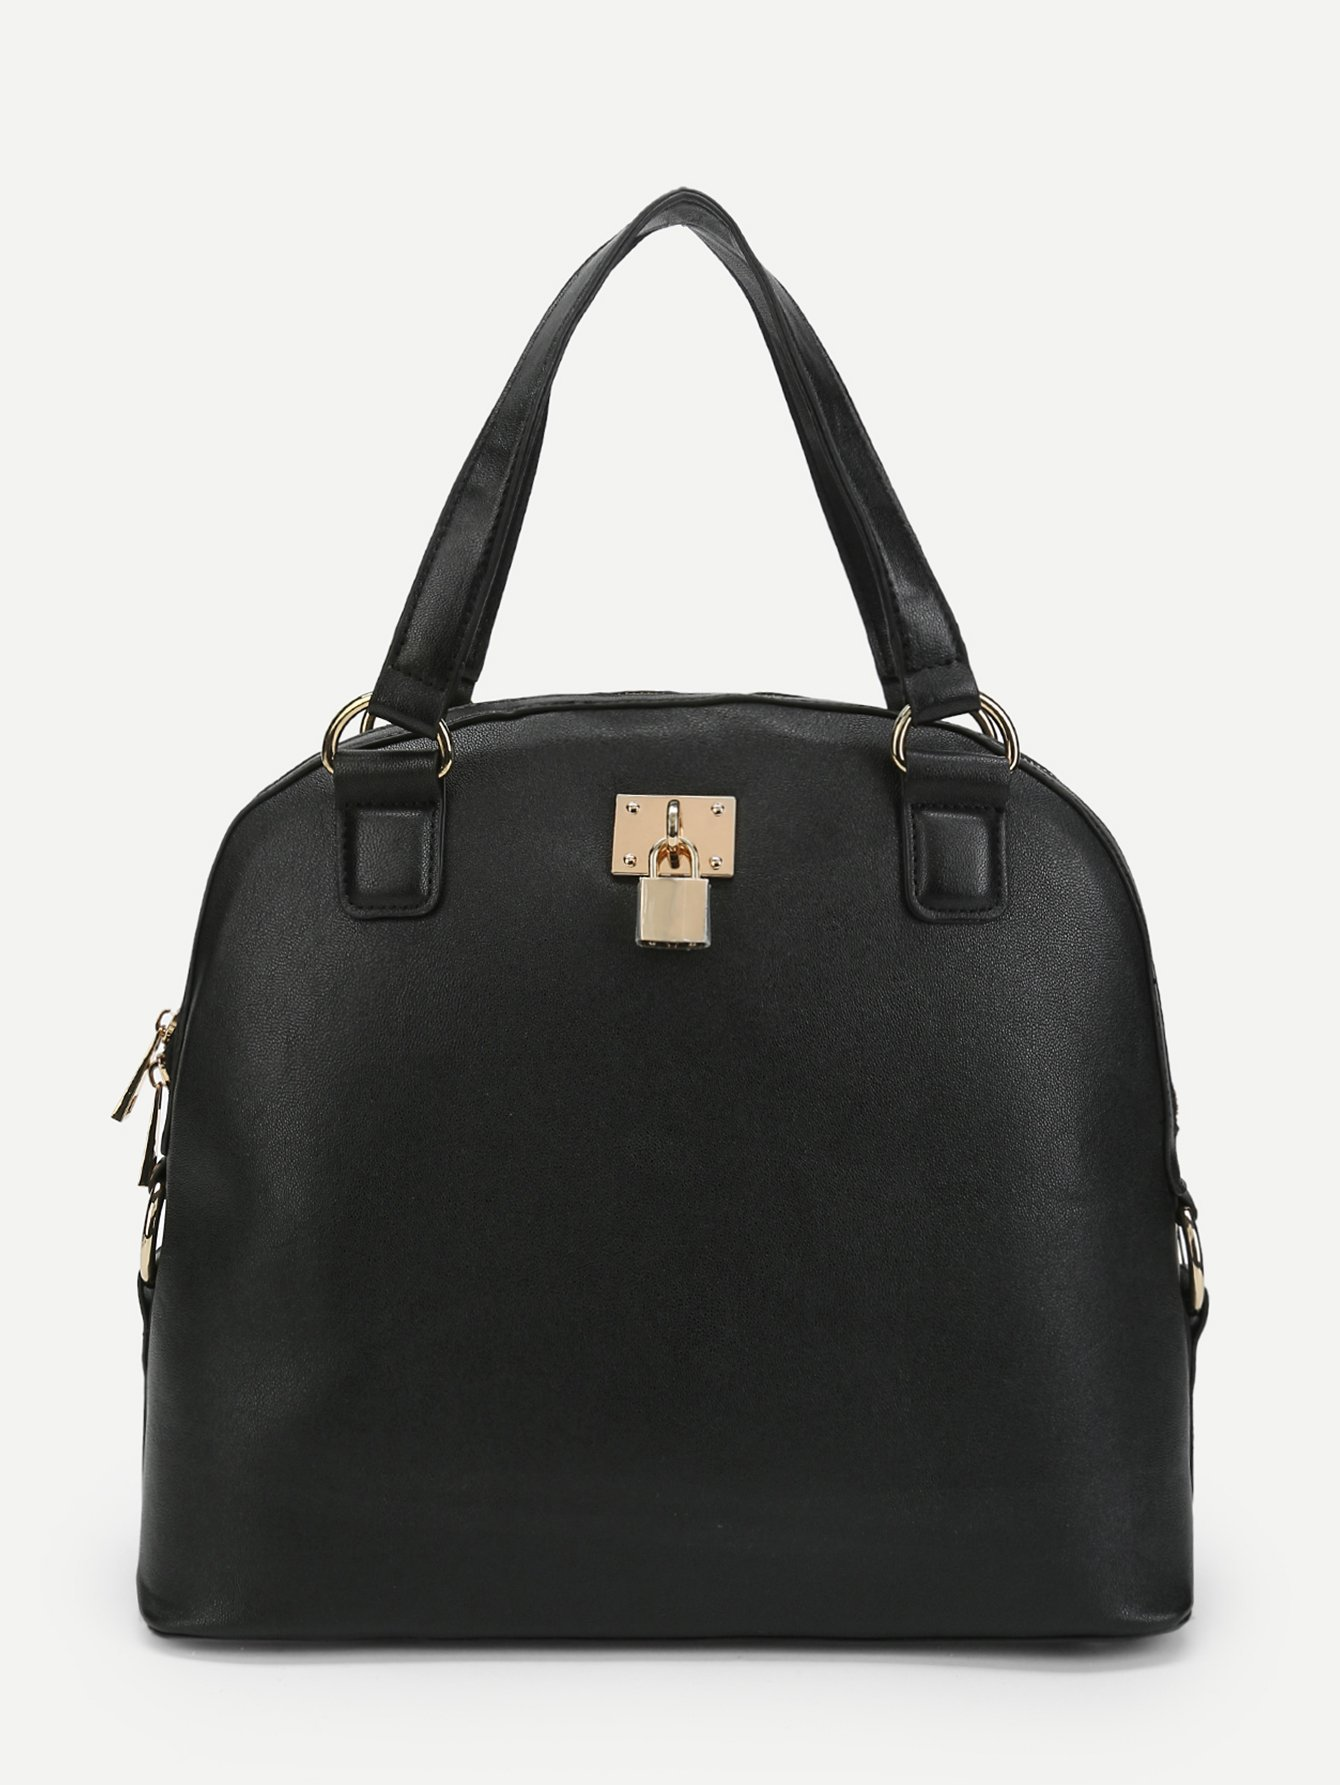 Double Handle PU Tote Bag